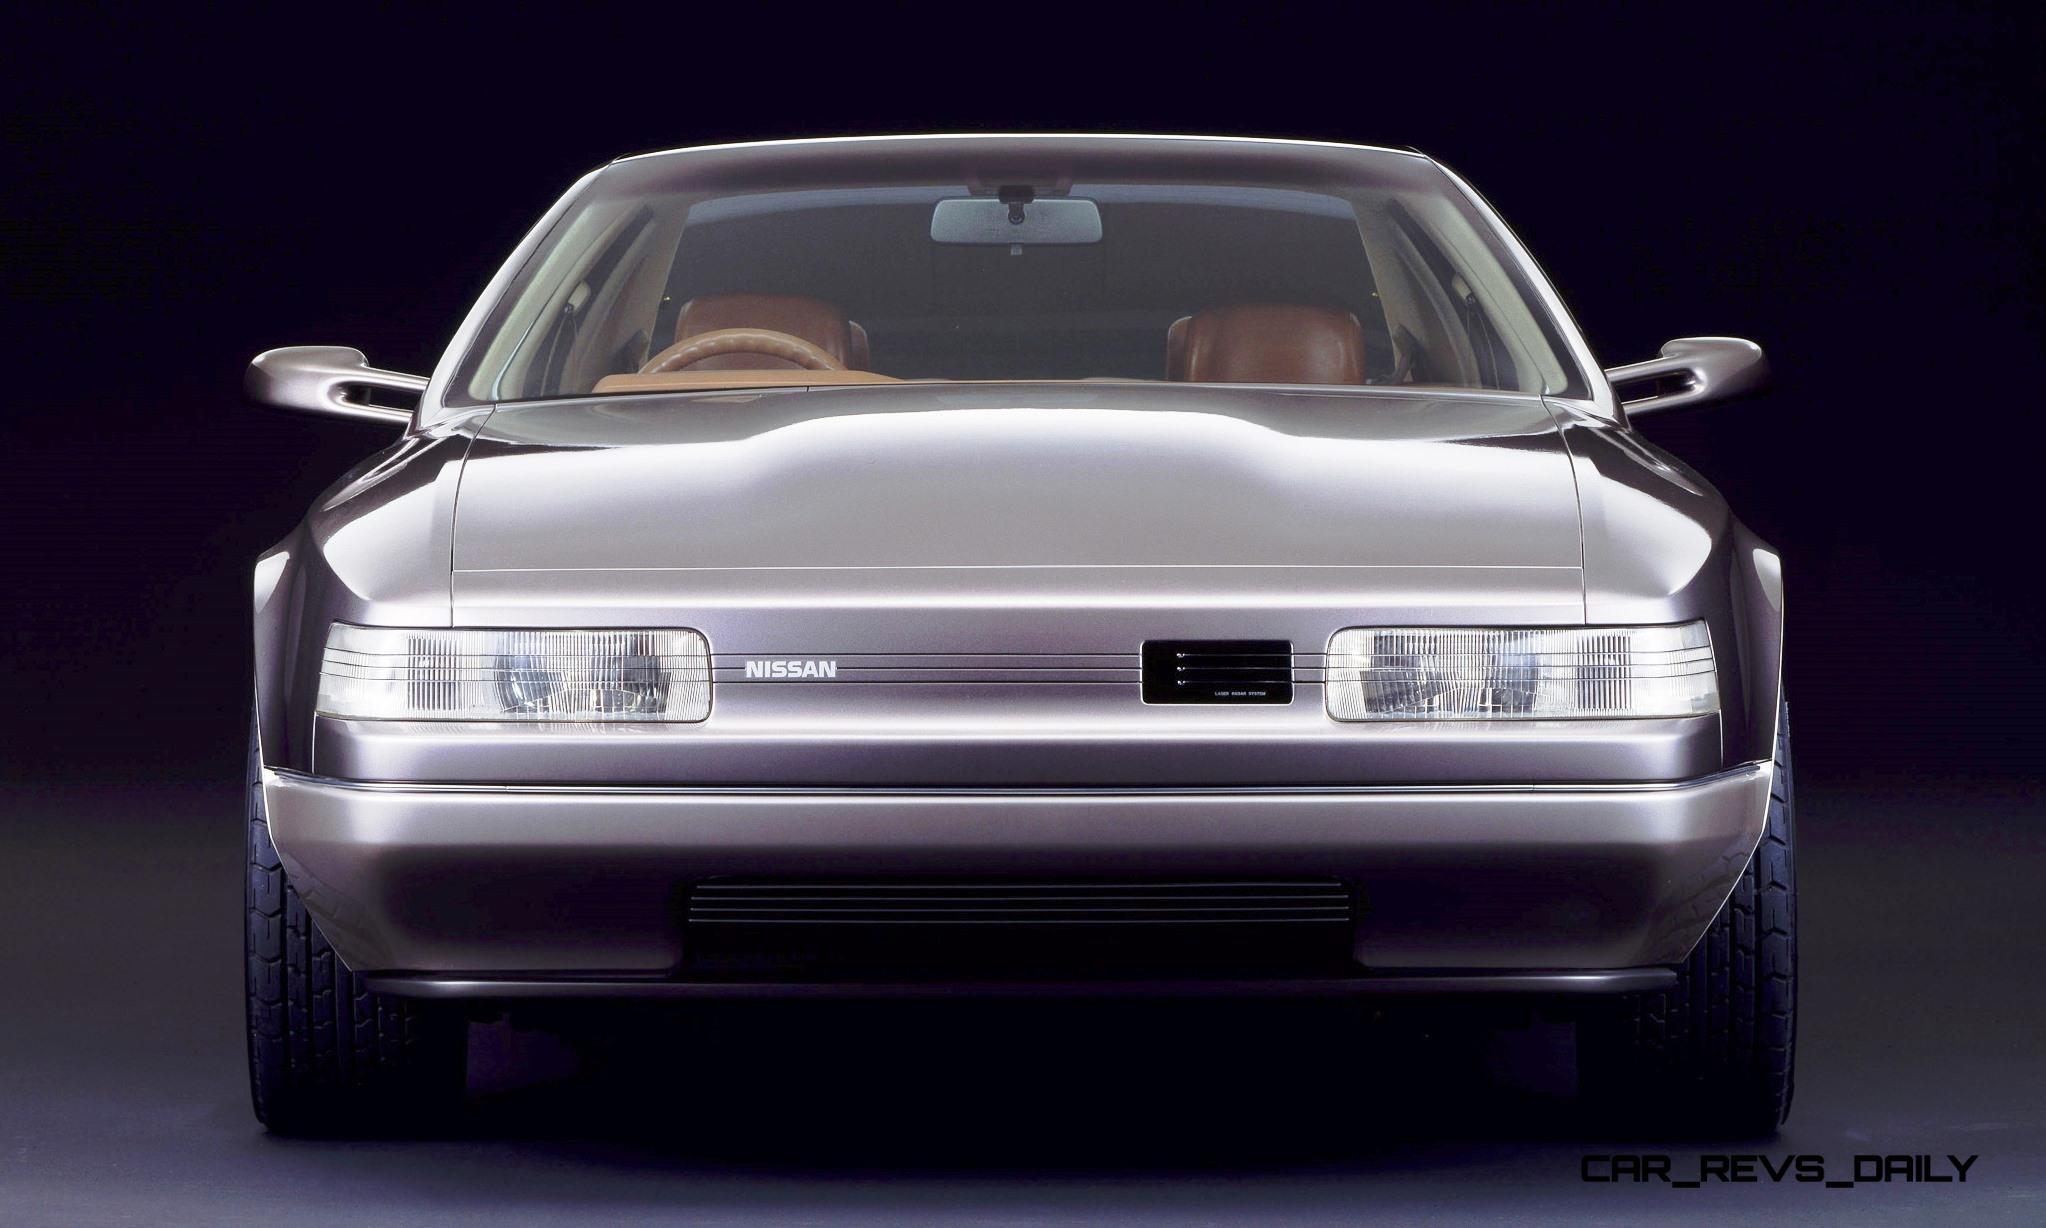 Concept Flashback - 1985 Nissan Cue-X Inspired Original Infiniti Q45 Flagship and Future Q80